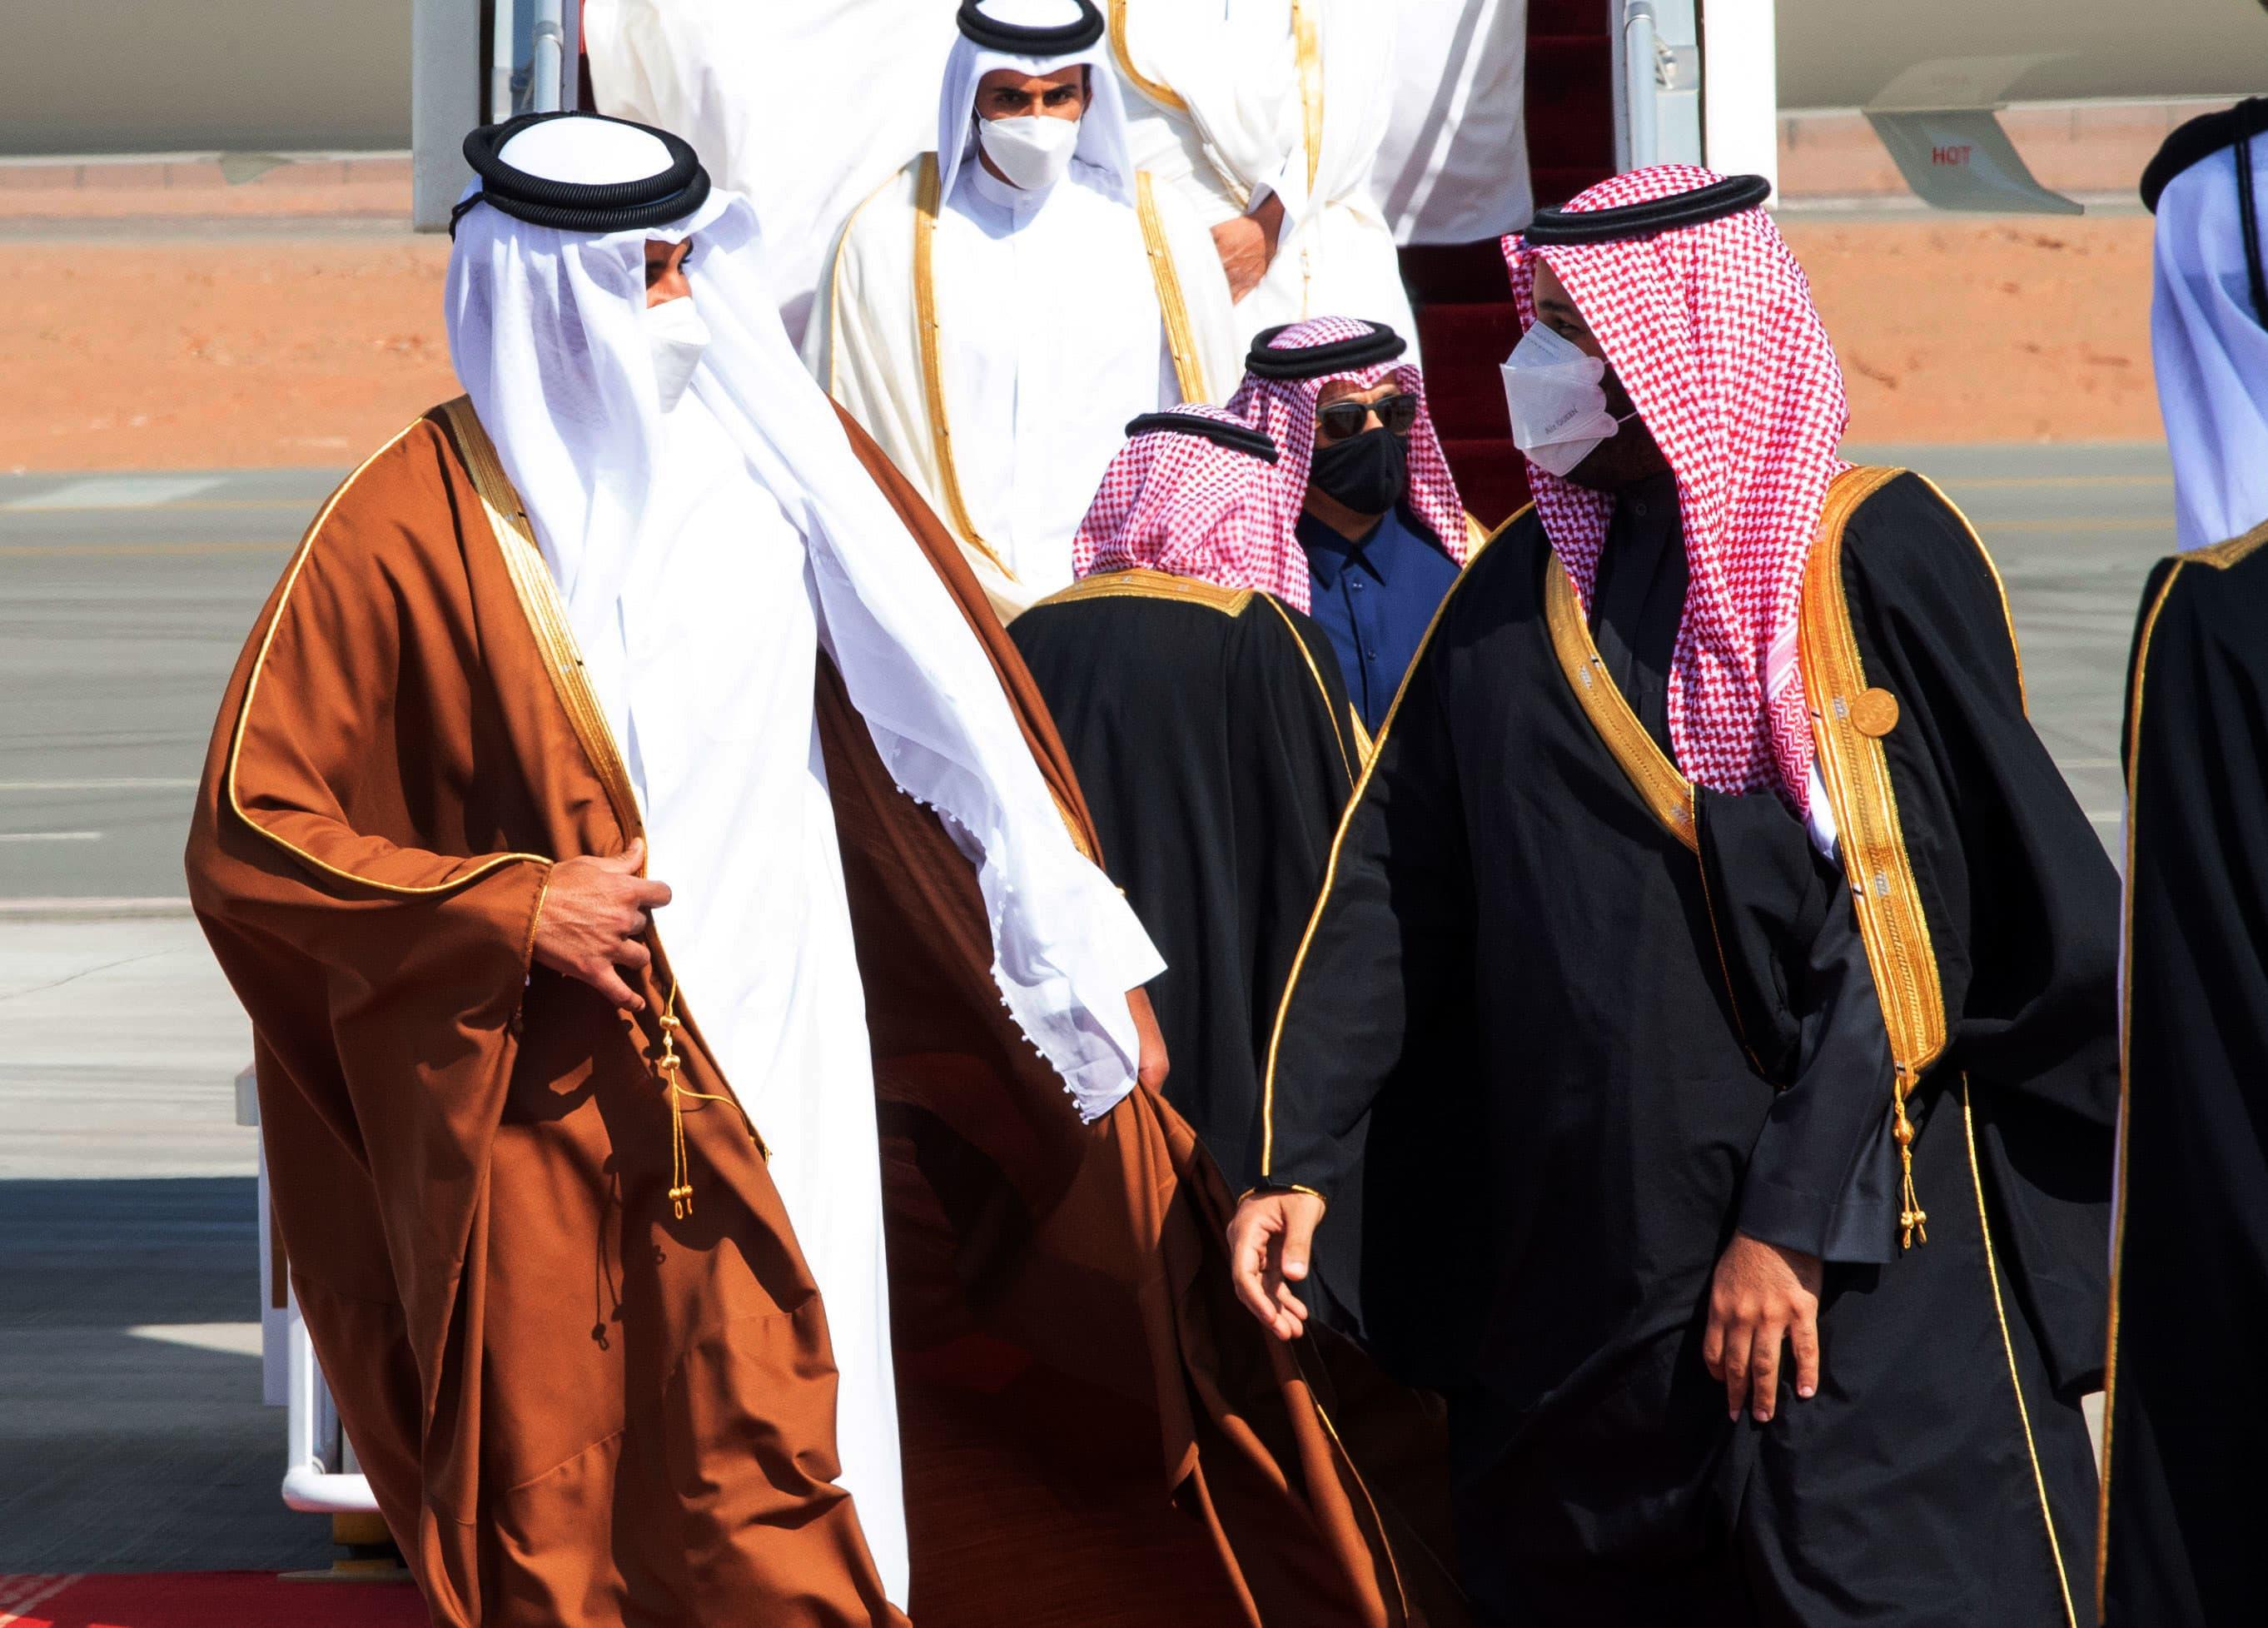 Saudi Arabia restores diplomatic ties with Qatar after three-year rift – CNBC